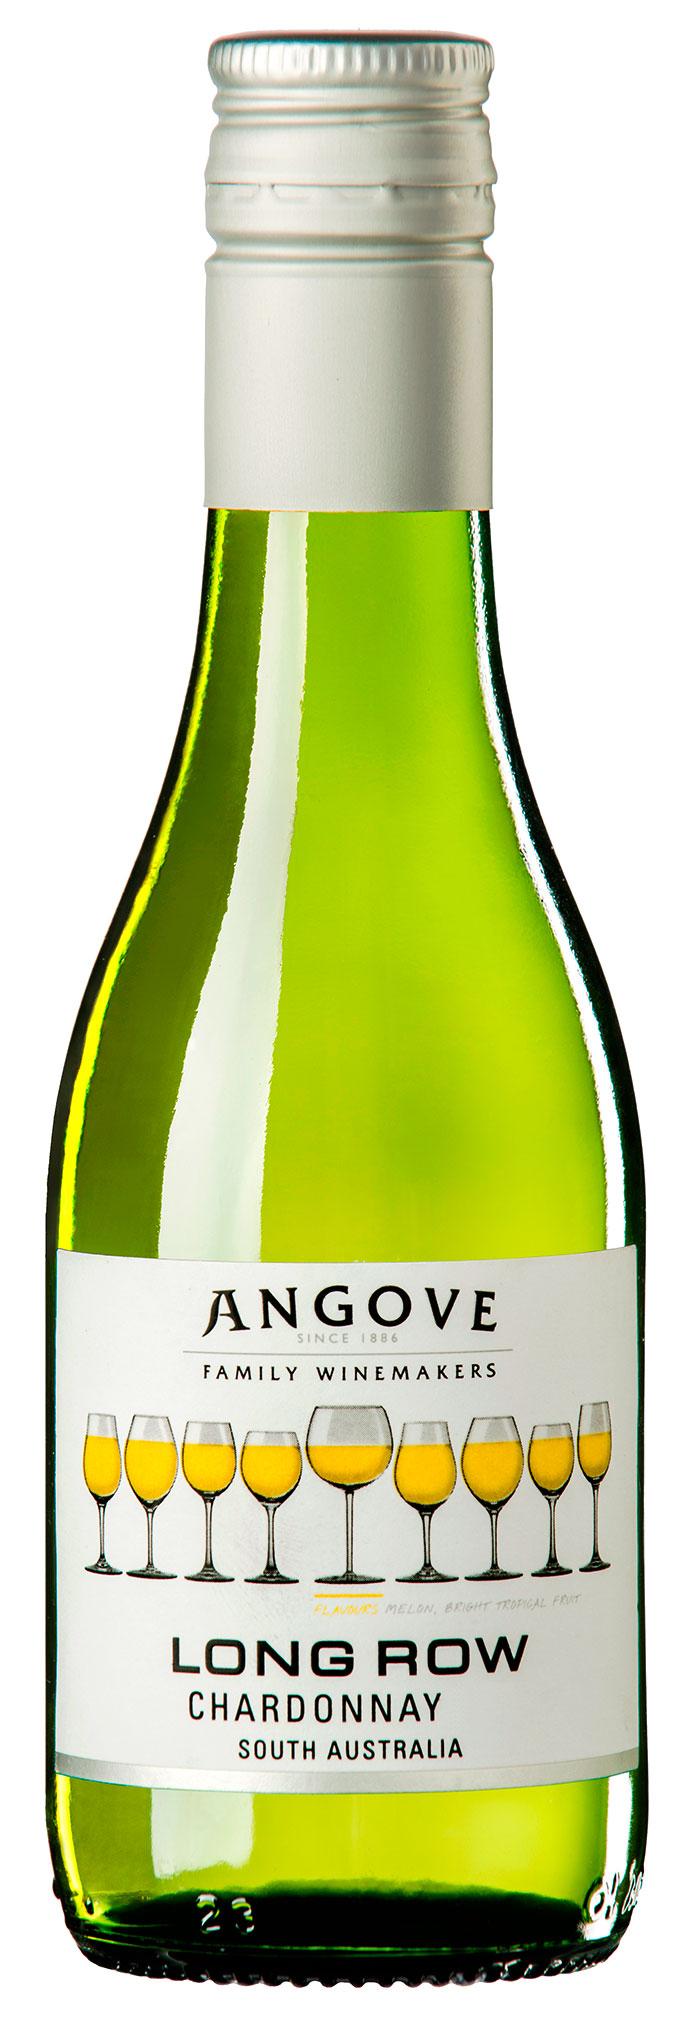 https://vinocorpperu.com/images/vinos/angove/long_row_chardonnay_2019_187.jpg